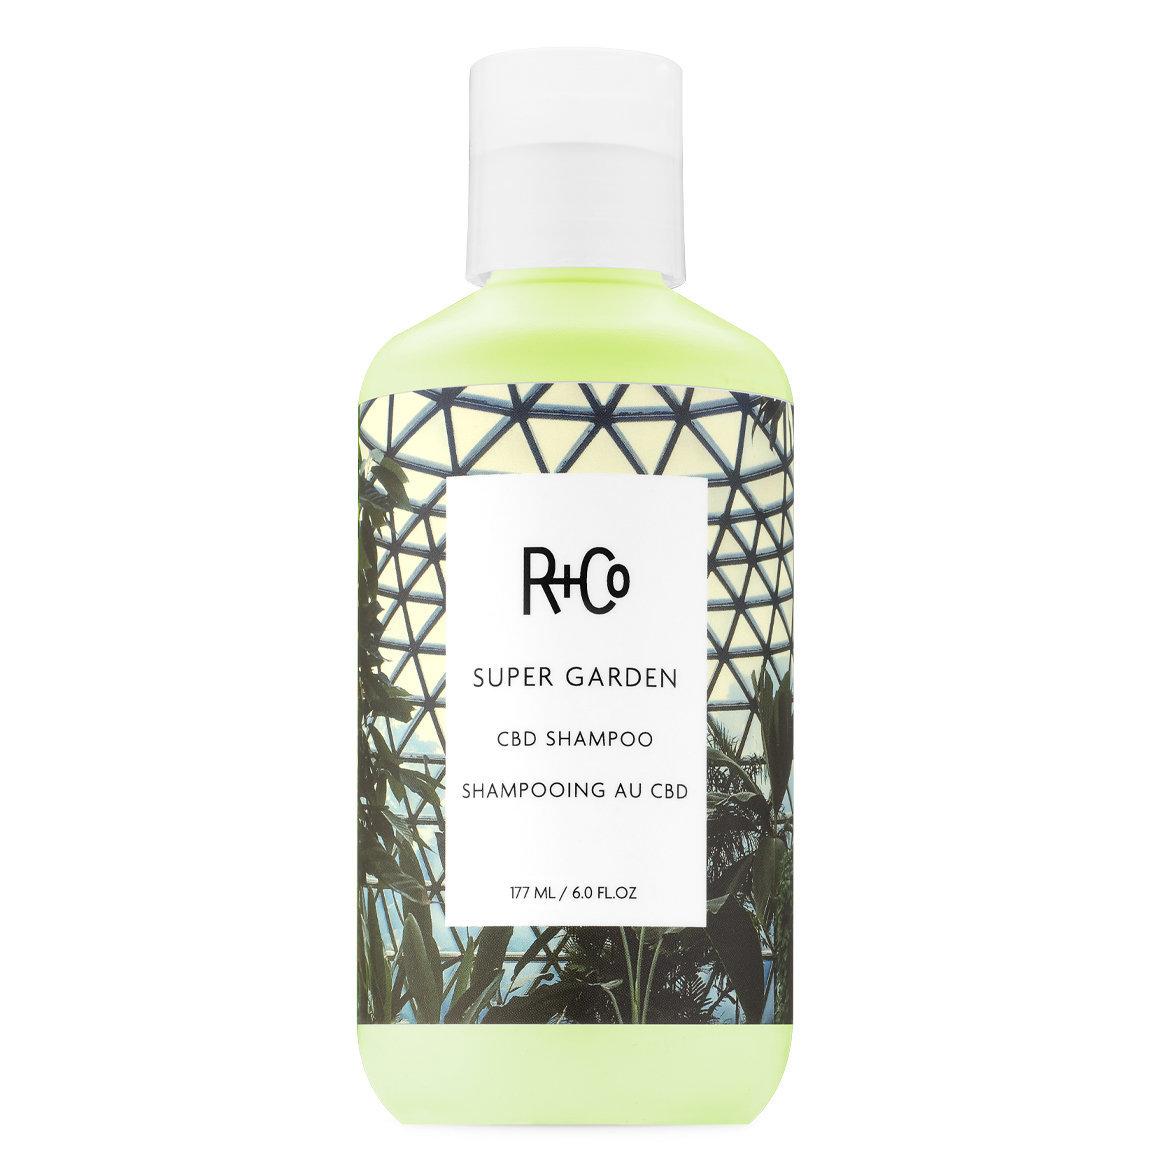 R+Co Super Garden CBD Shampoo alternative view 1 - product swatch.